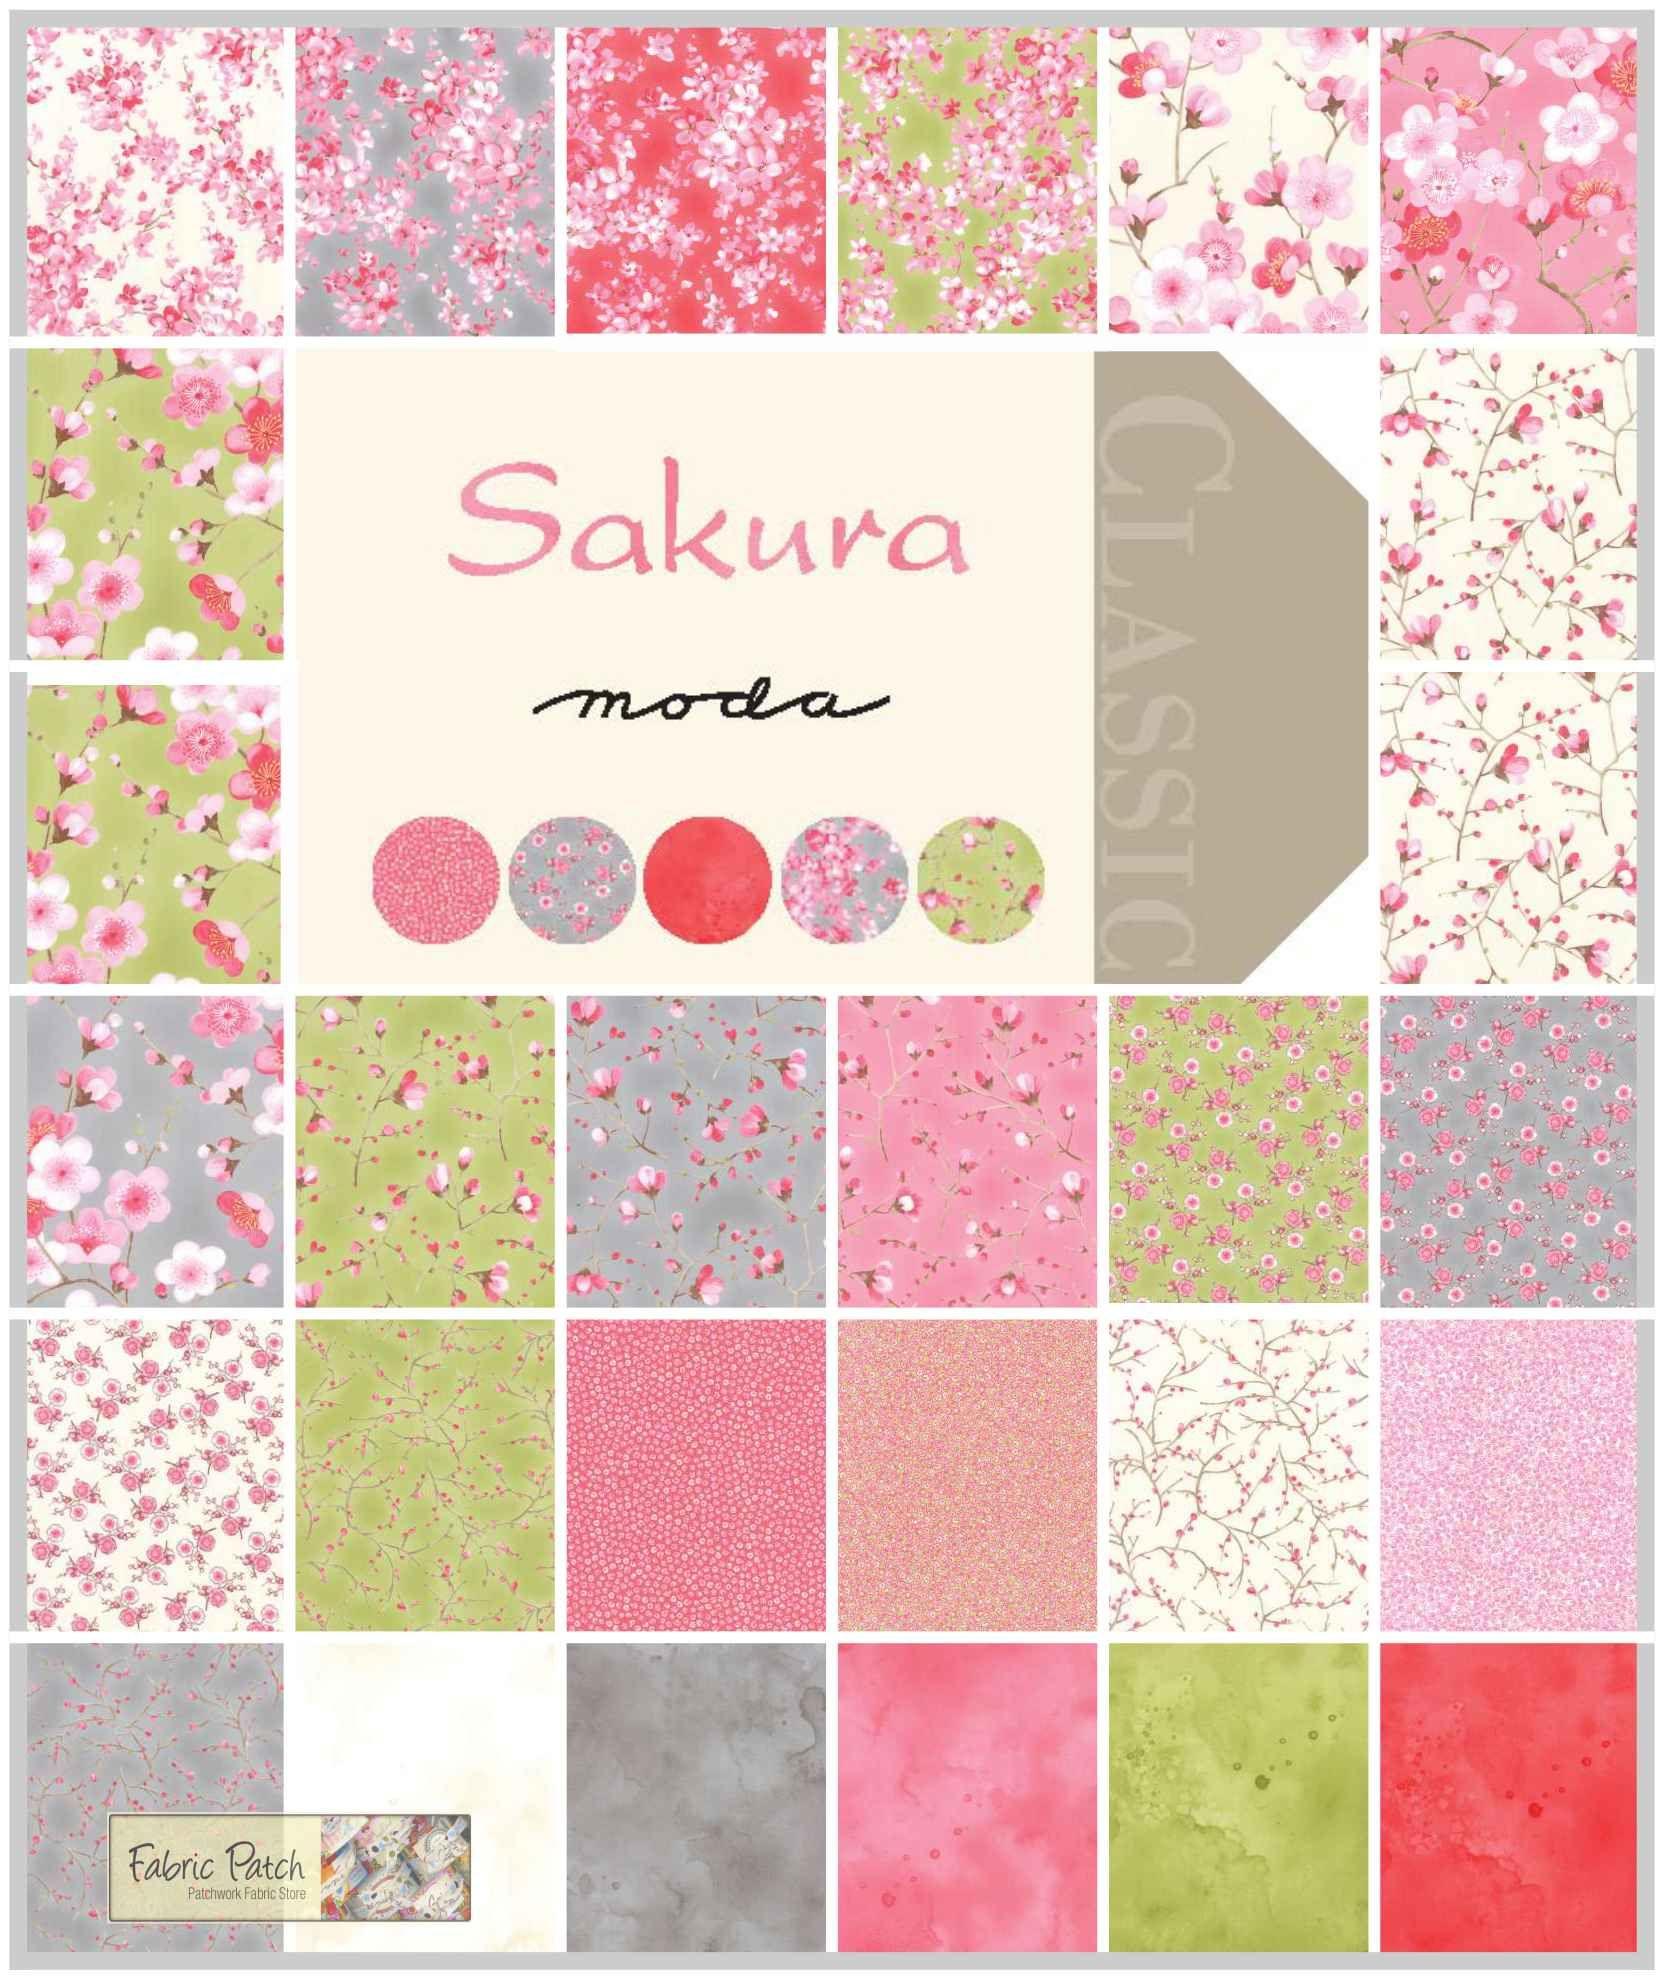 Sakura Fat Quarter Bundle. by Sentimental Studios for Moda Fabrics ... : moda quilting fabric - Adamdwight.com